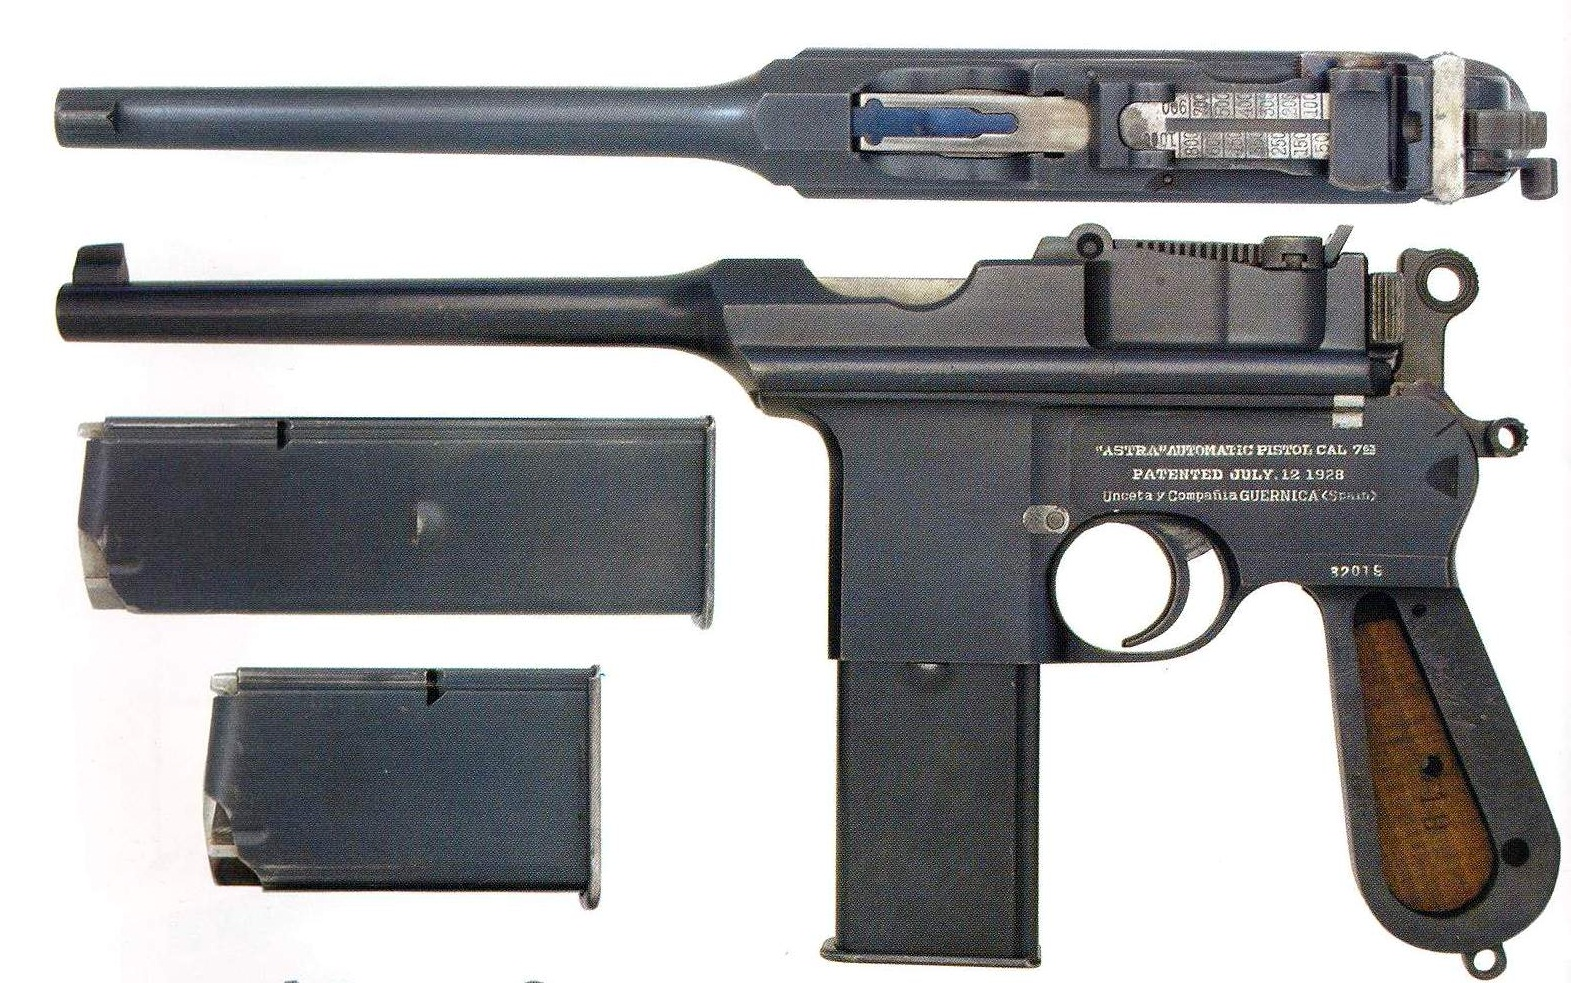 Pistole Astra Model 903